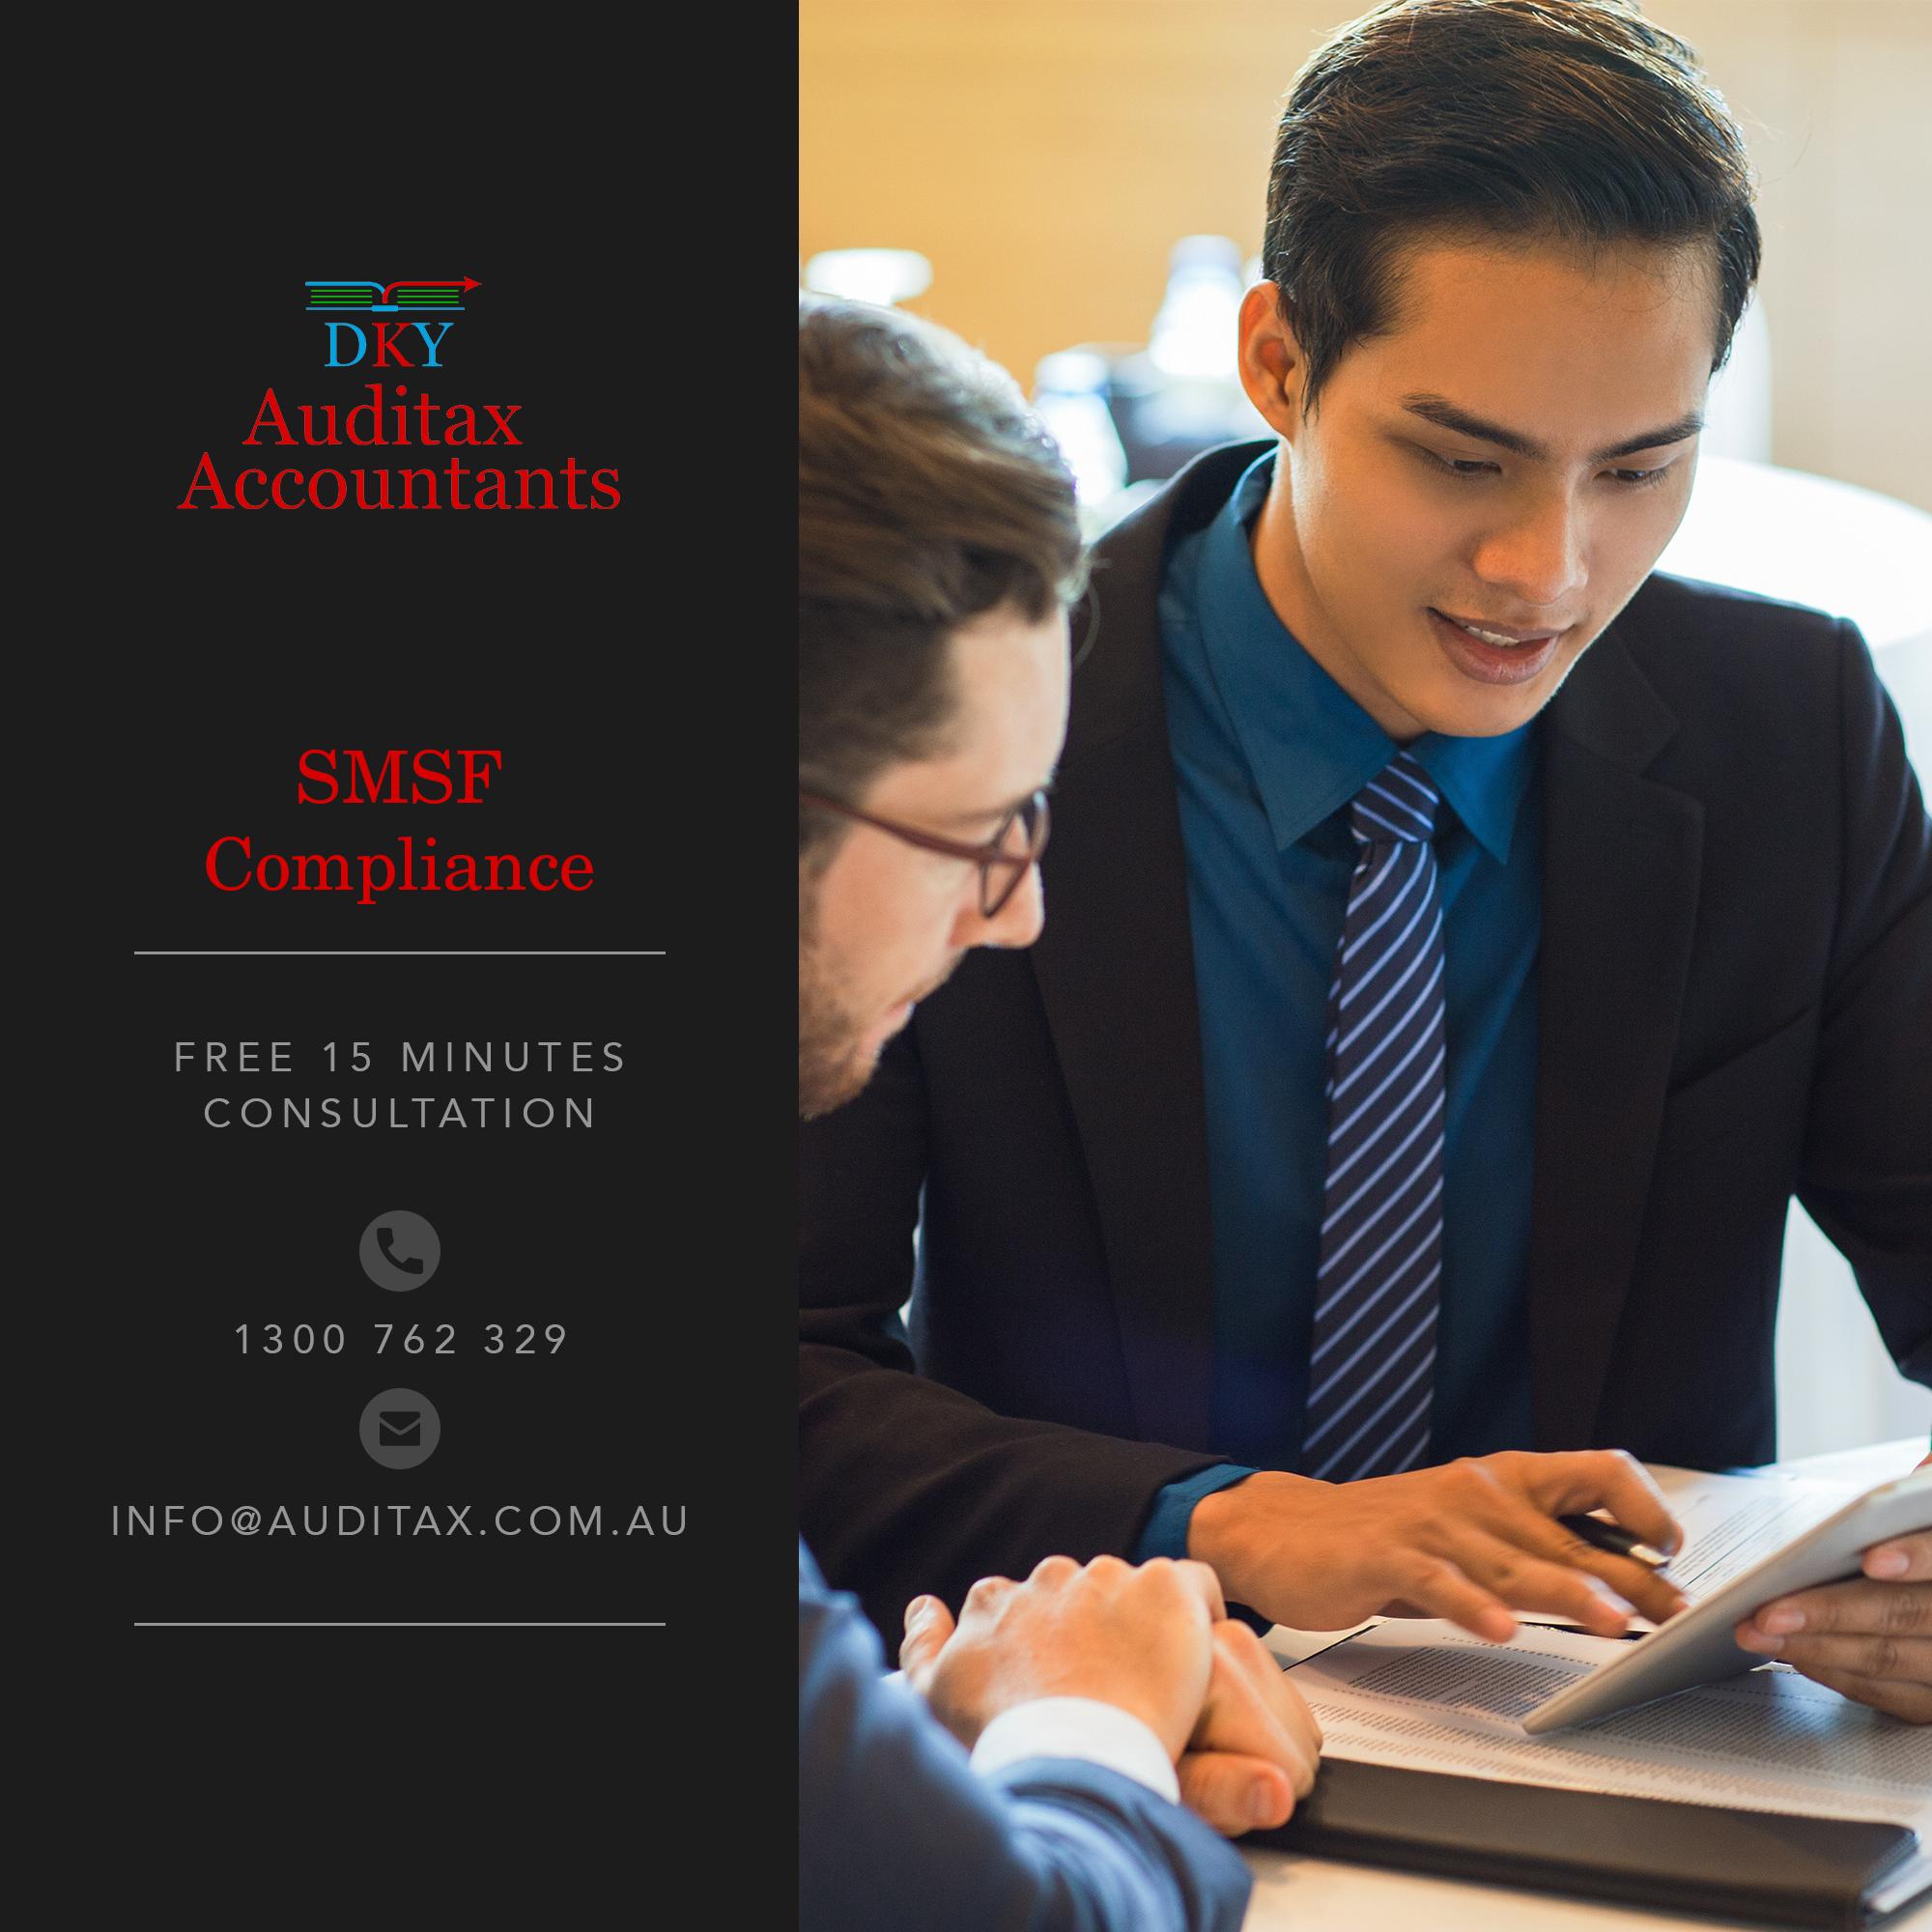 Perth SMSF Accountant